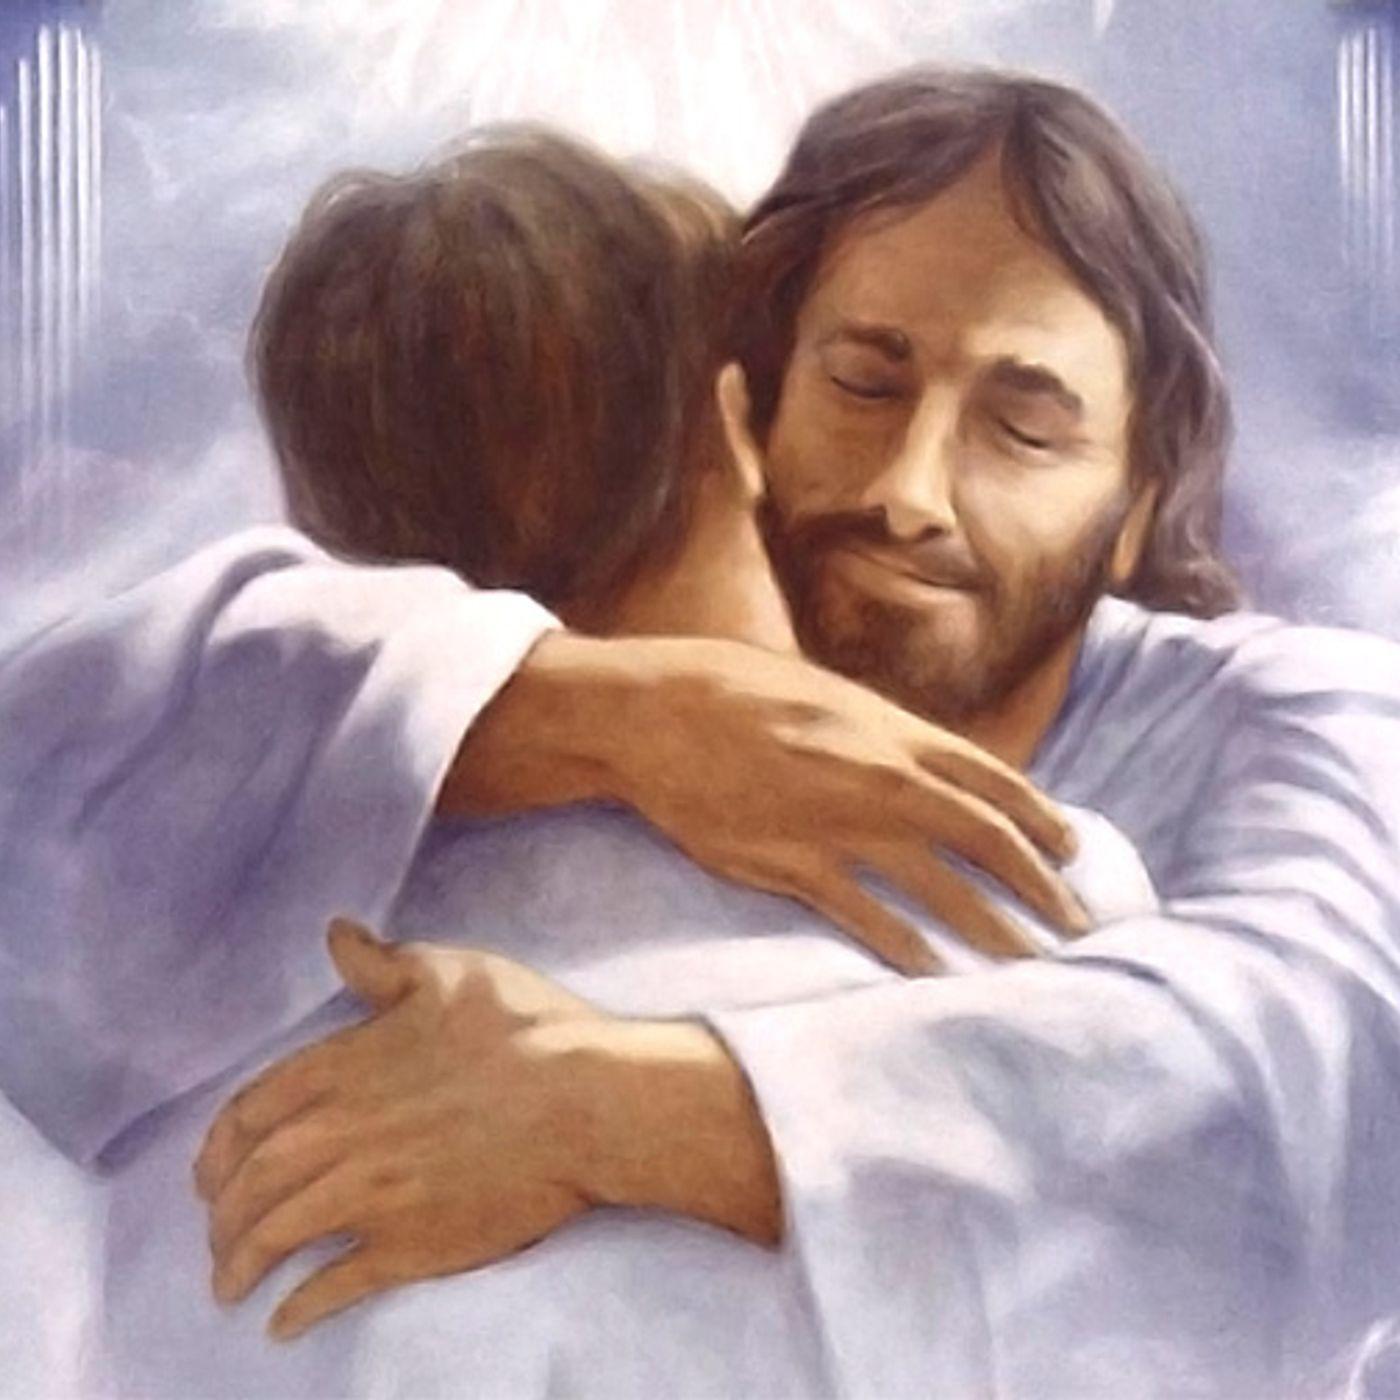 #PrayerforAmerica #PrayerofrPresidentTrump @DeAnna4Congress @PastorGregCGR @realDonaldTrump @danielgelyana